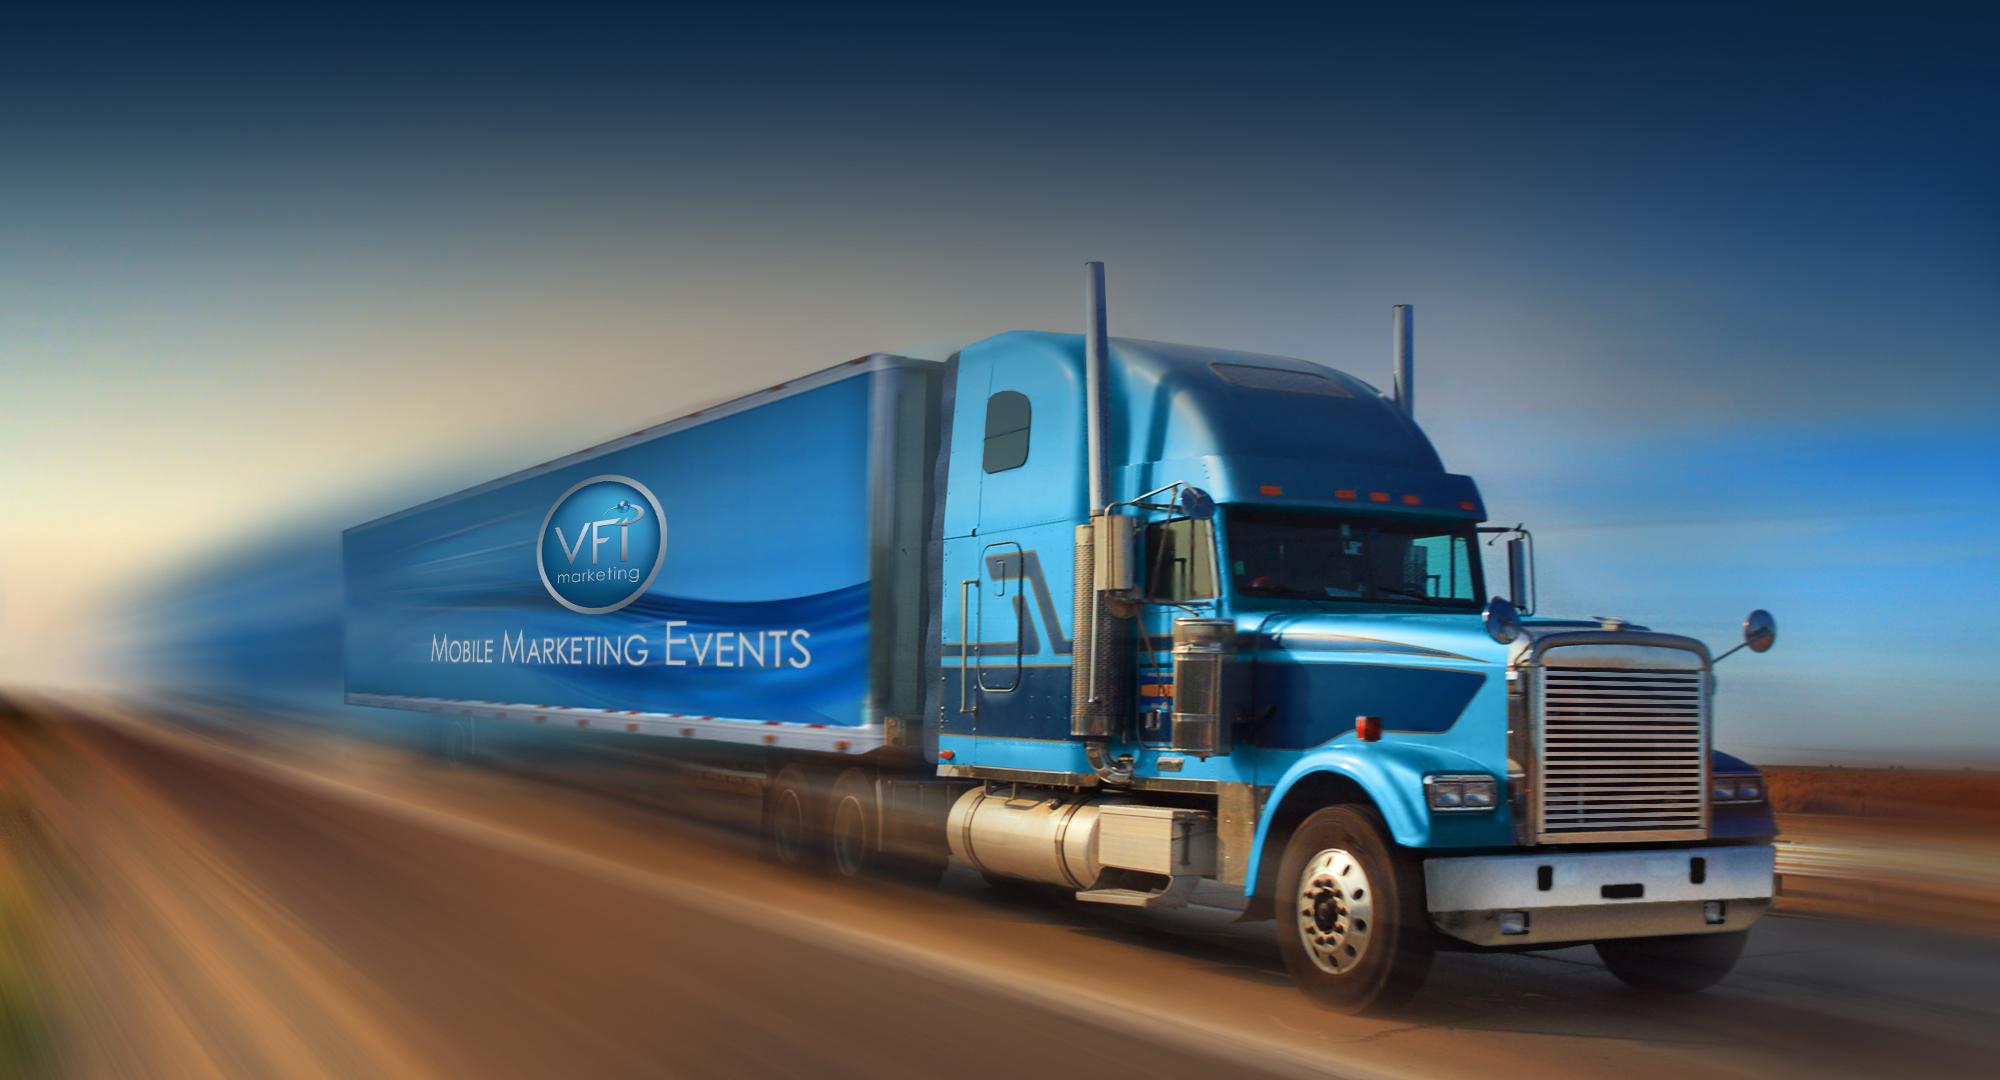 VFI Marketing - Mobile Marketing Units